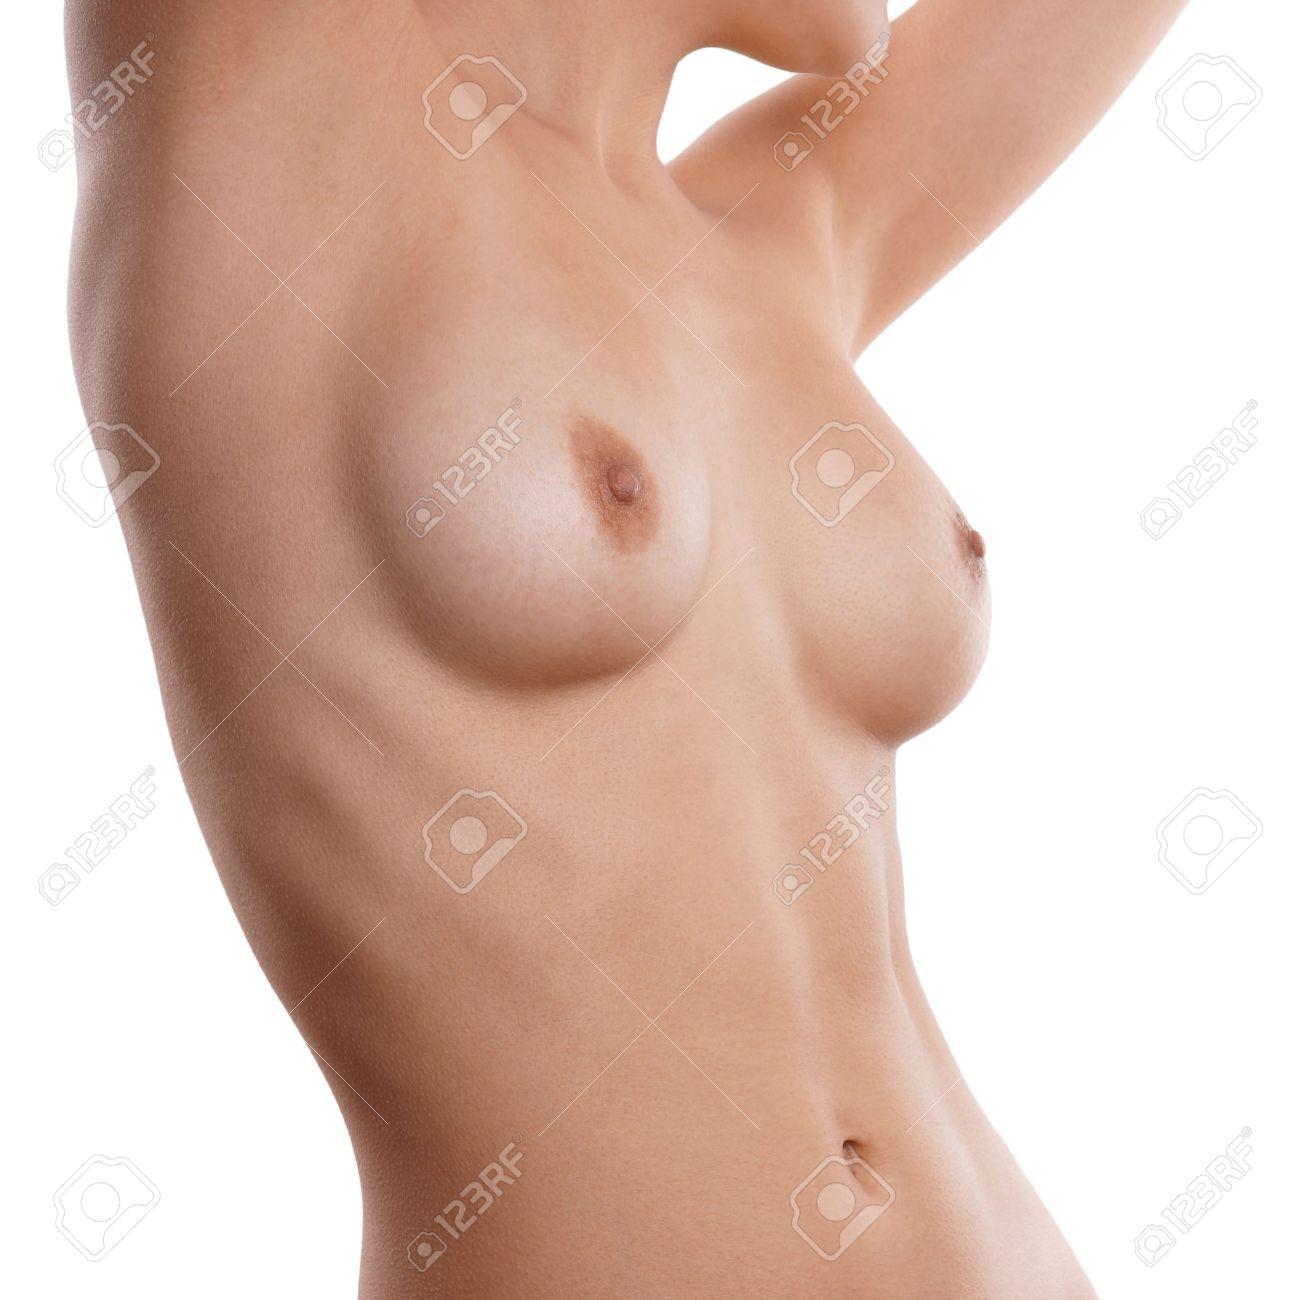 does lady gaga like anal sex